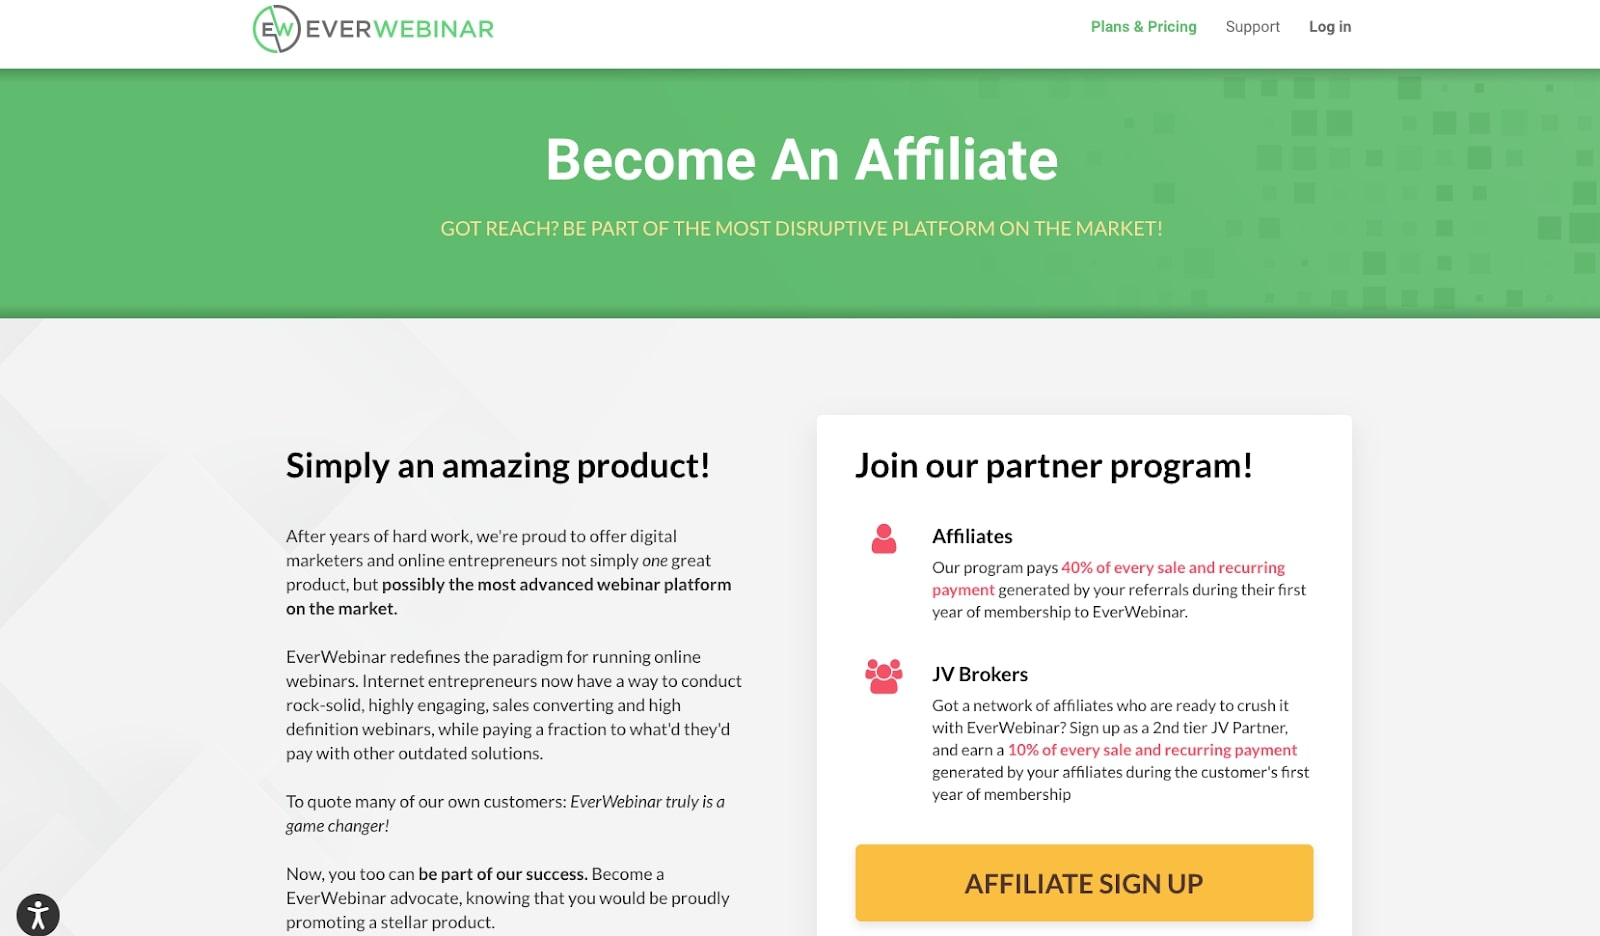 Screenshot of EverWebinar affiliate program website